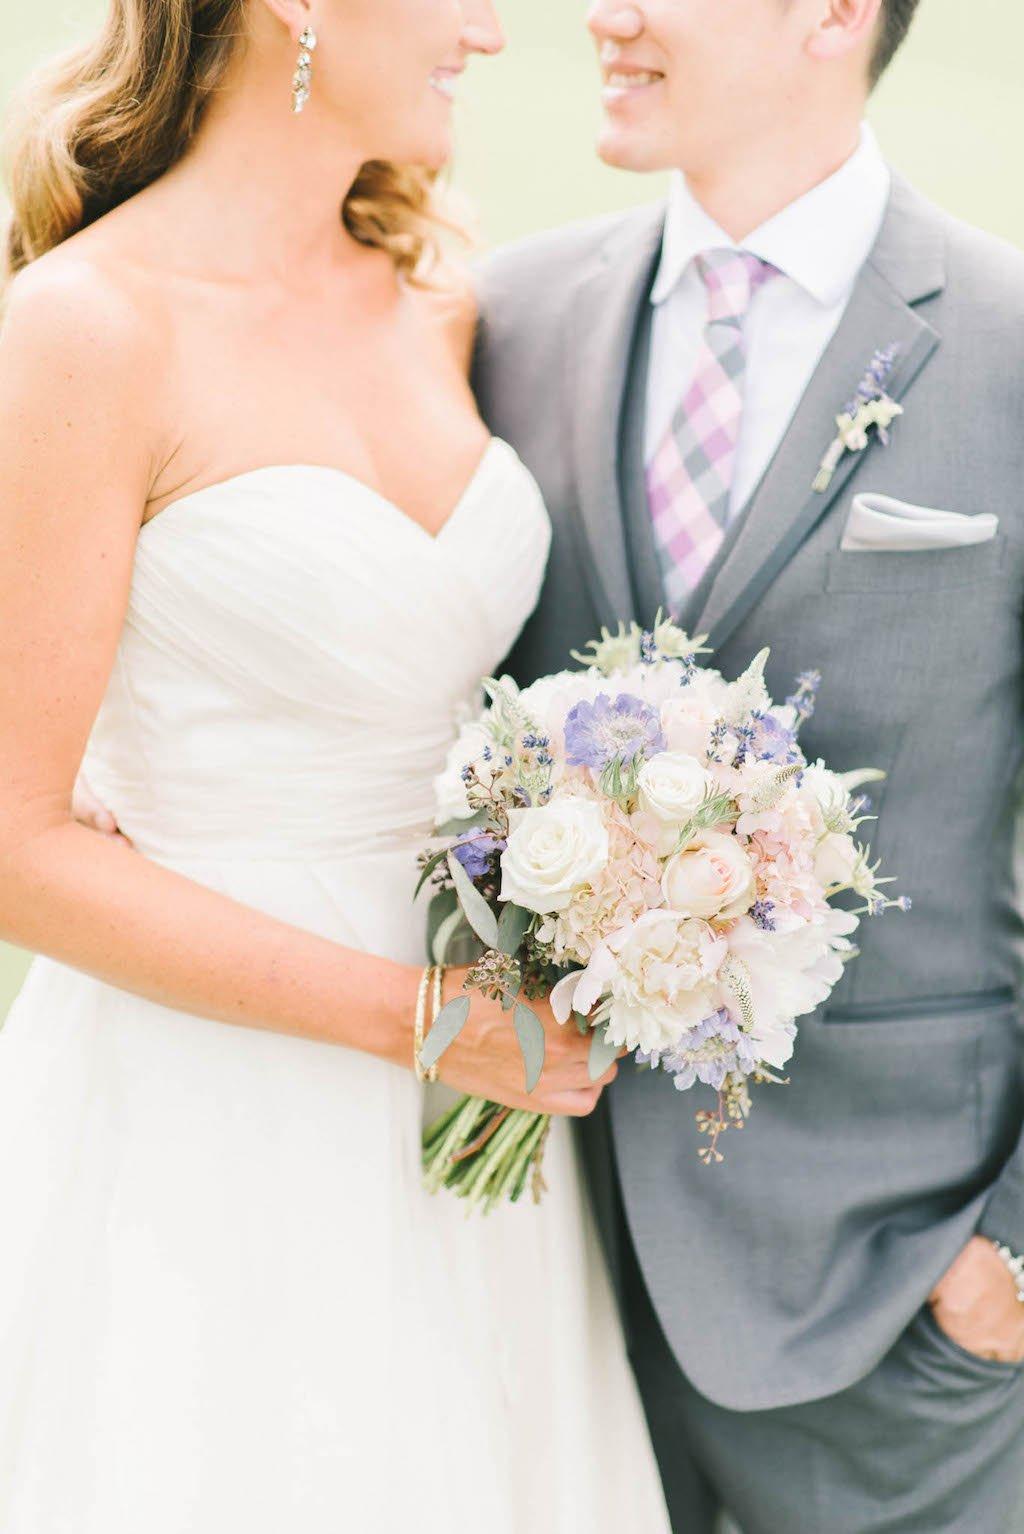 1-25-16-dreamy-pastel-maryland-vineyard-wedding-lizfogarty-4